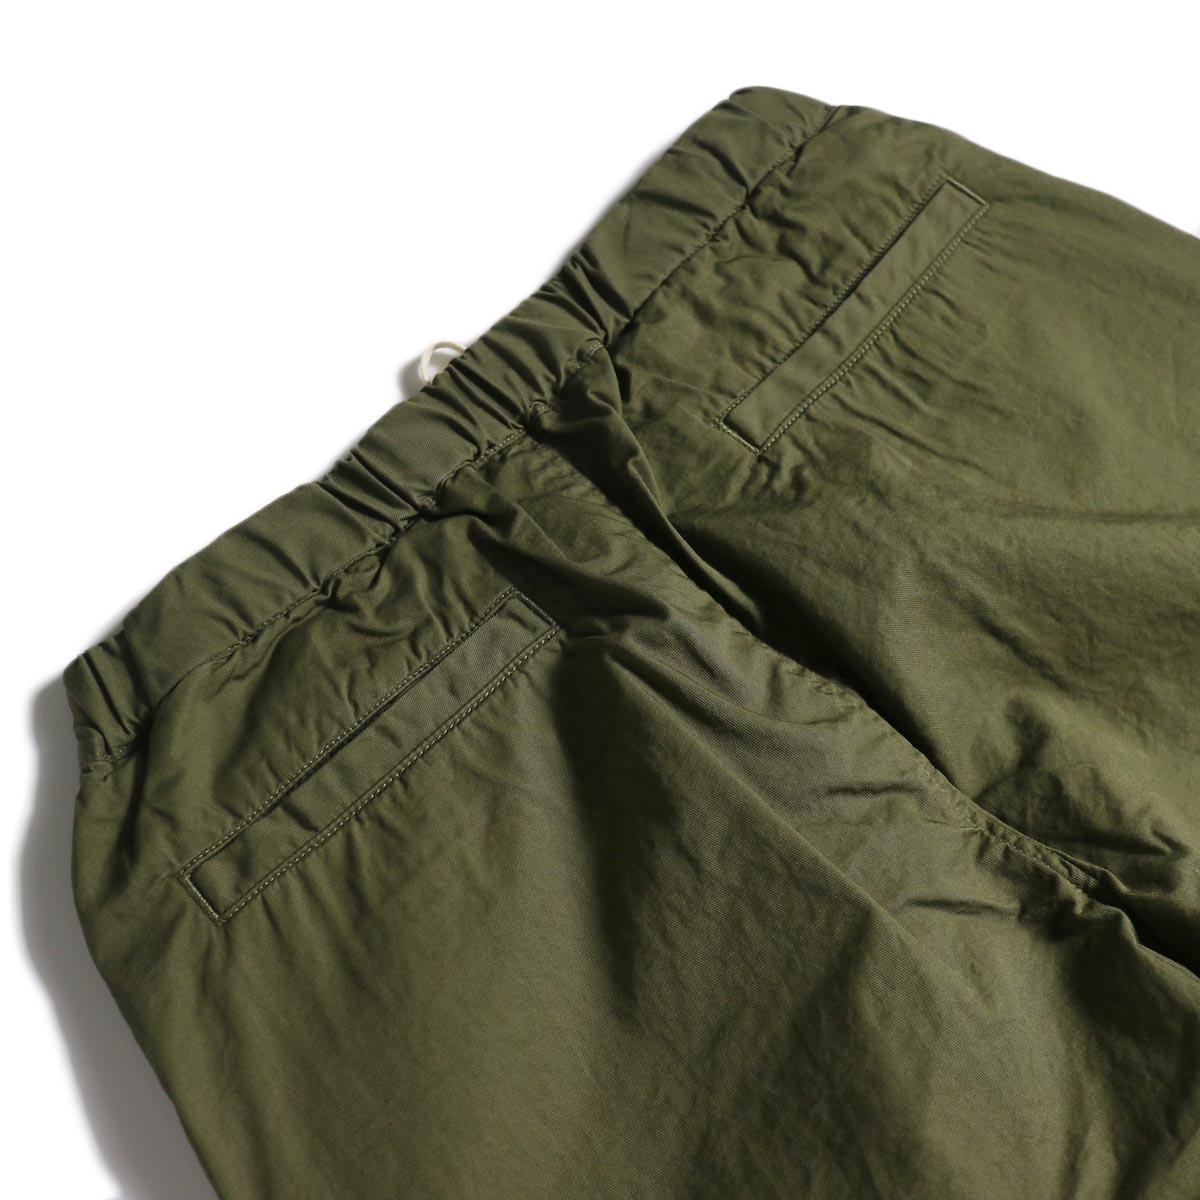 BRENA / Cotton&Linen Washer Kersey Coq Pants (Amg)ヒップポケット